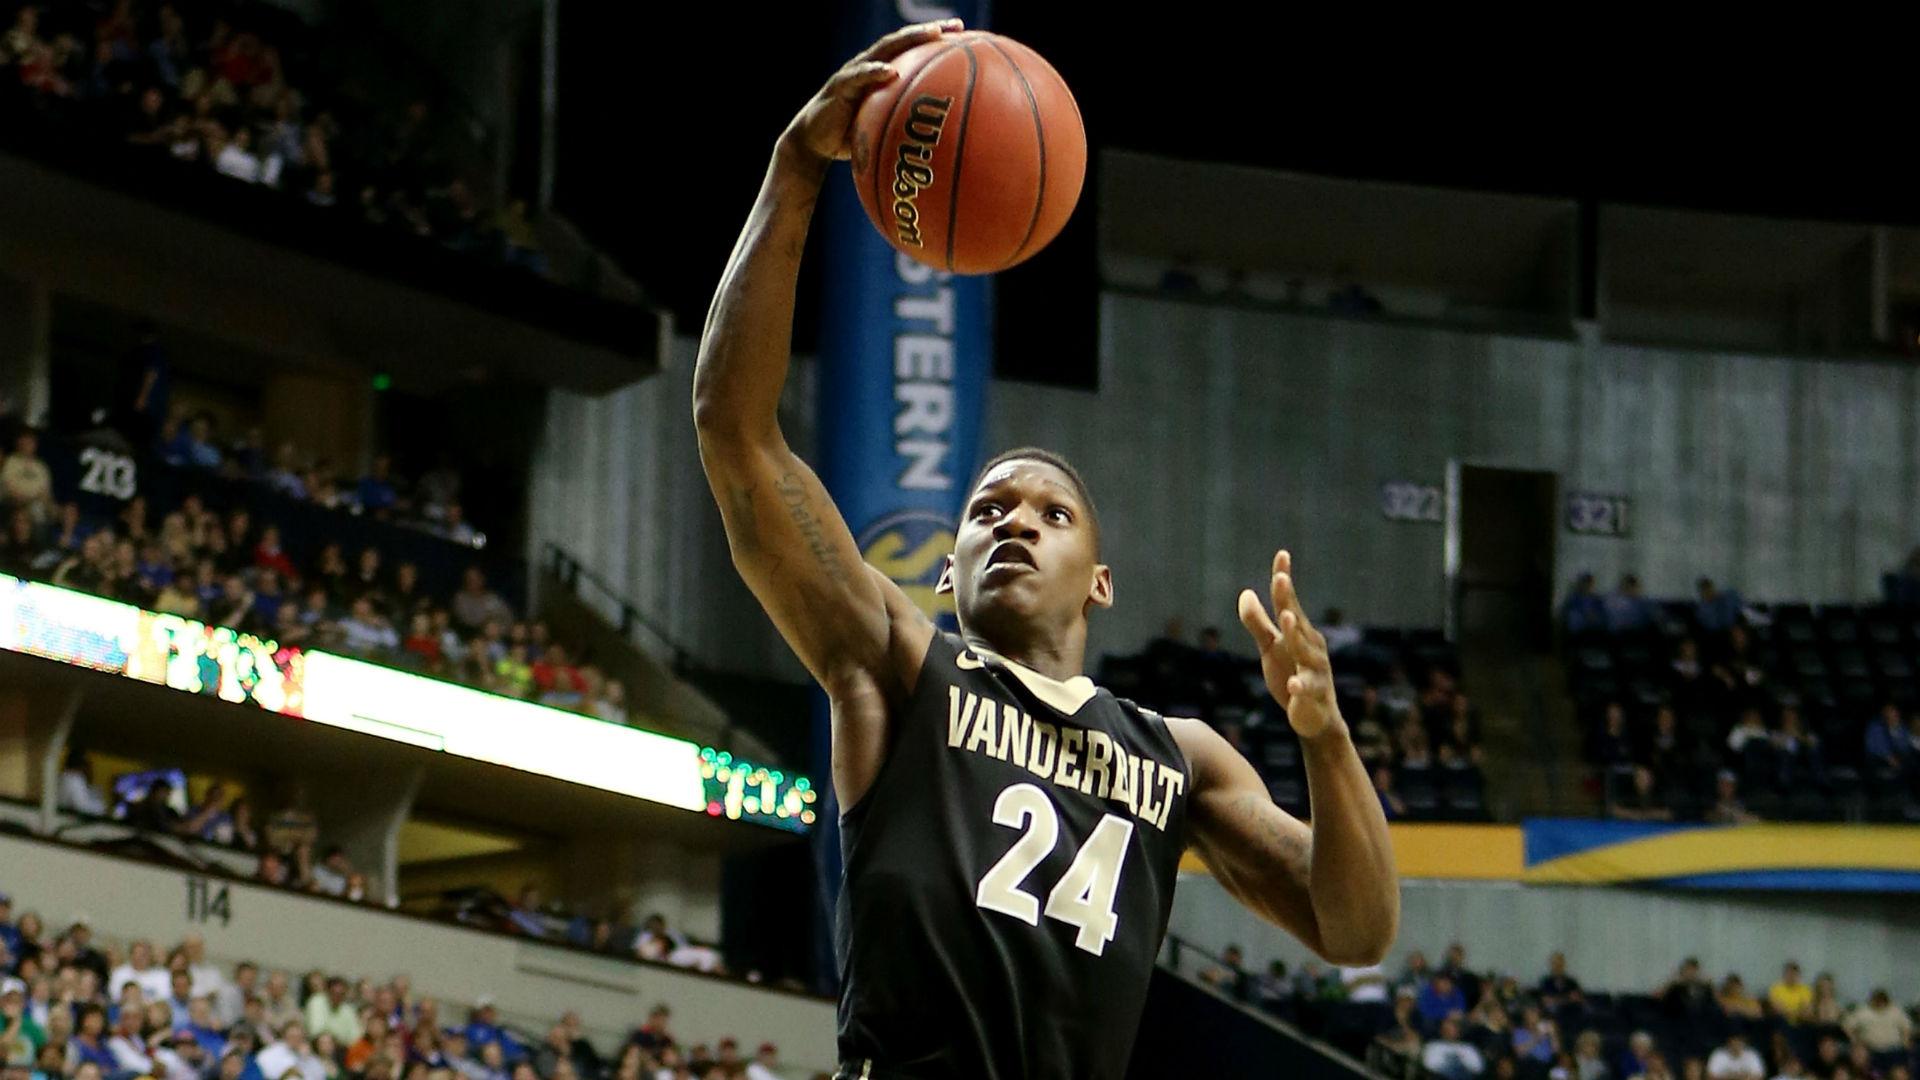 Ex-Vanderbilt basketball player Dai-Jon Parker dies in drowning accident